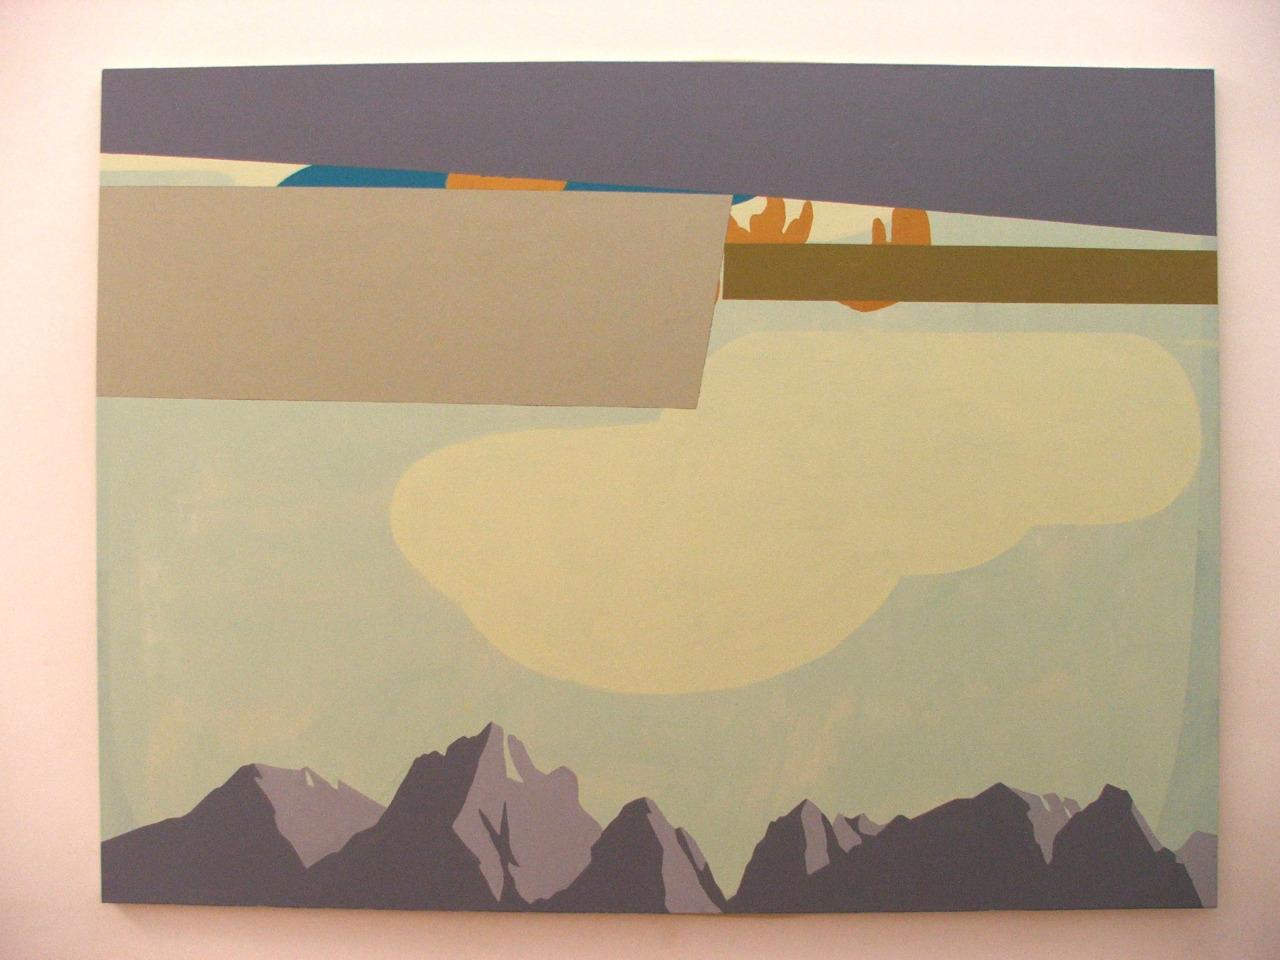 untitled, 2005, acrylic on canvas, 198x149cm